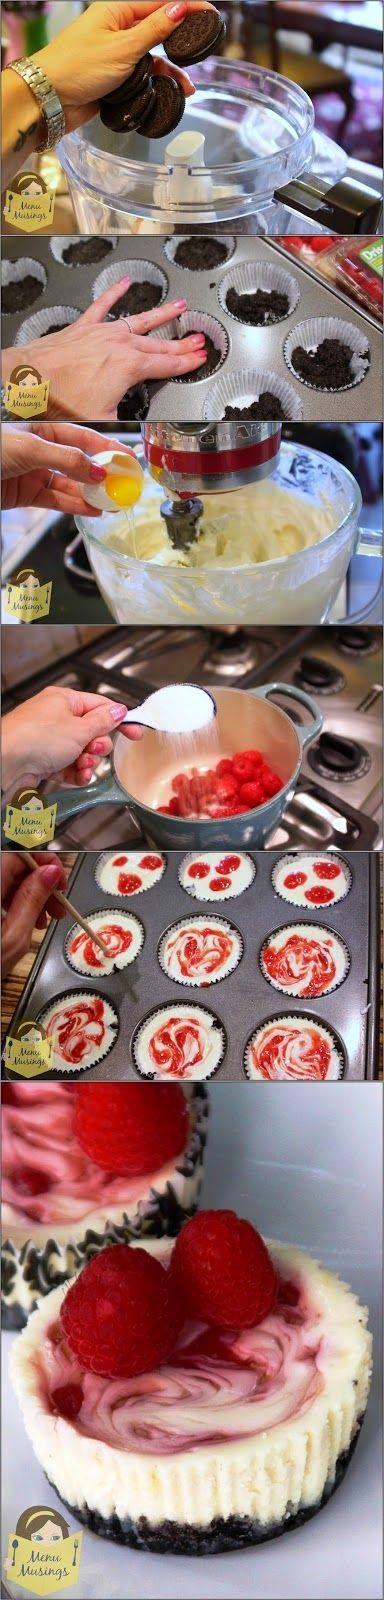 all-food-drink: Raspberry Swirl Mini Cheesecakes